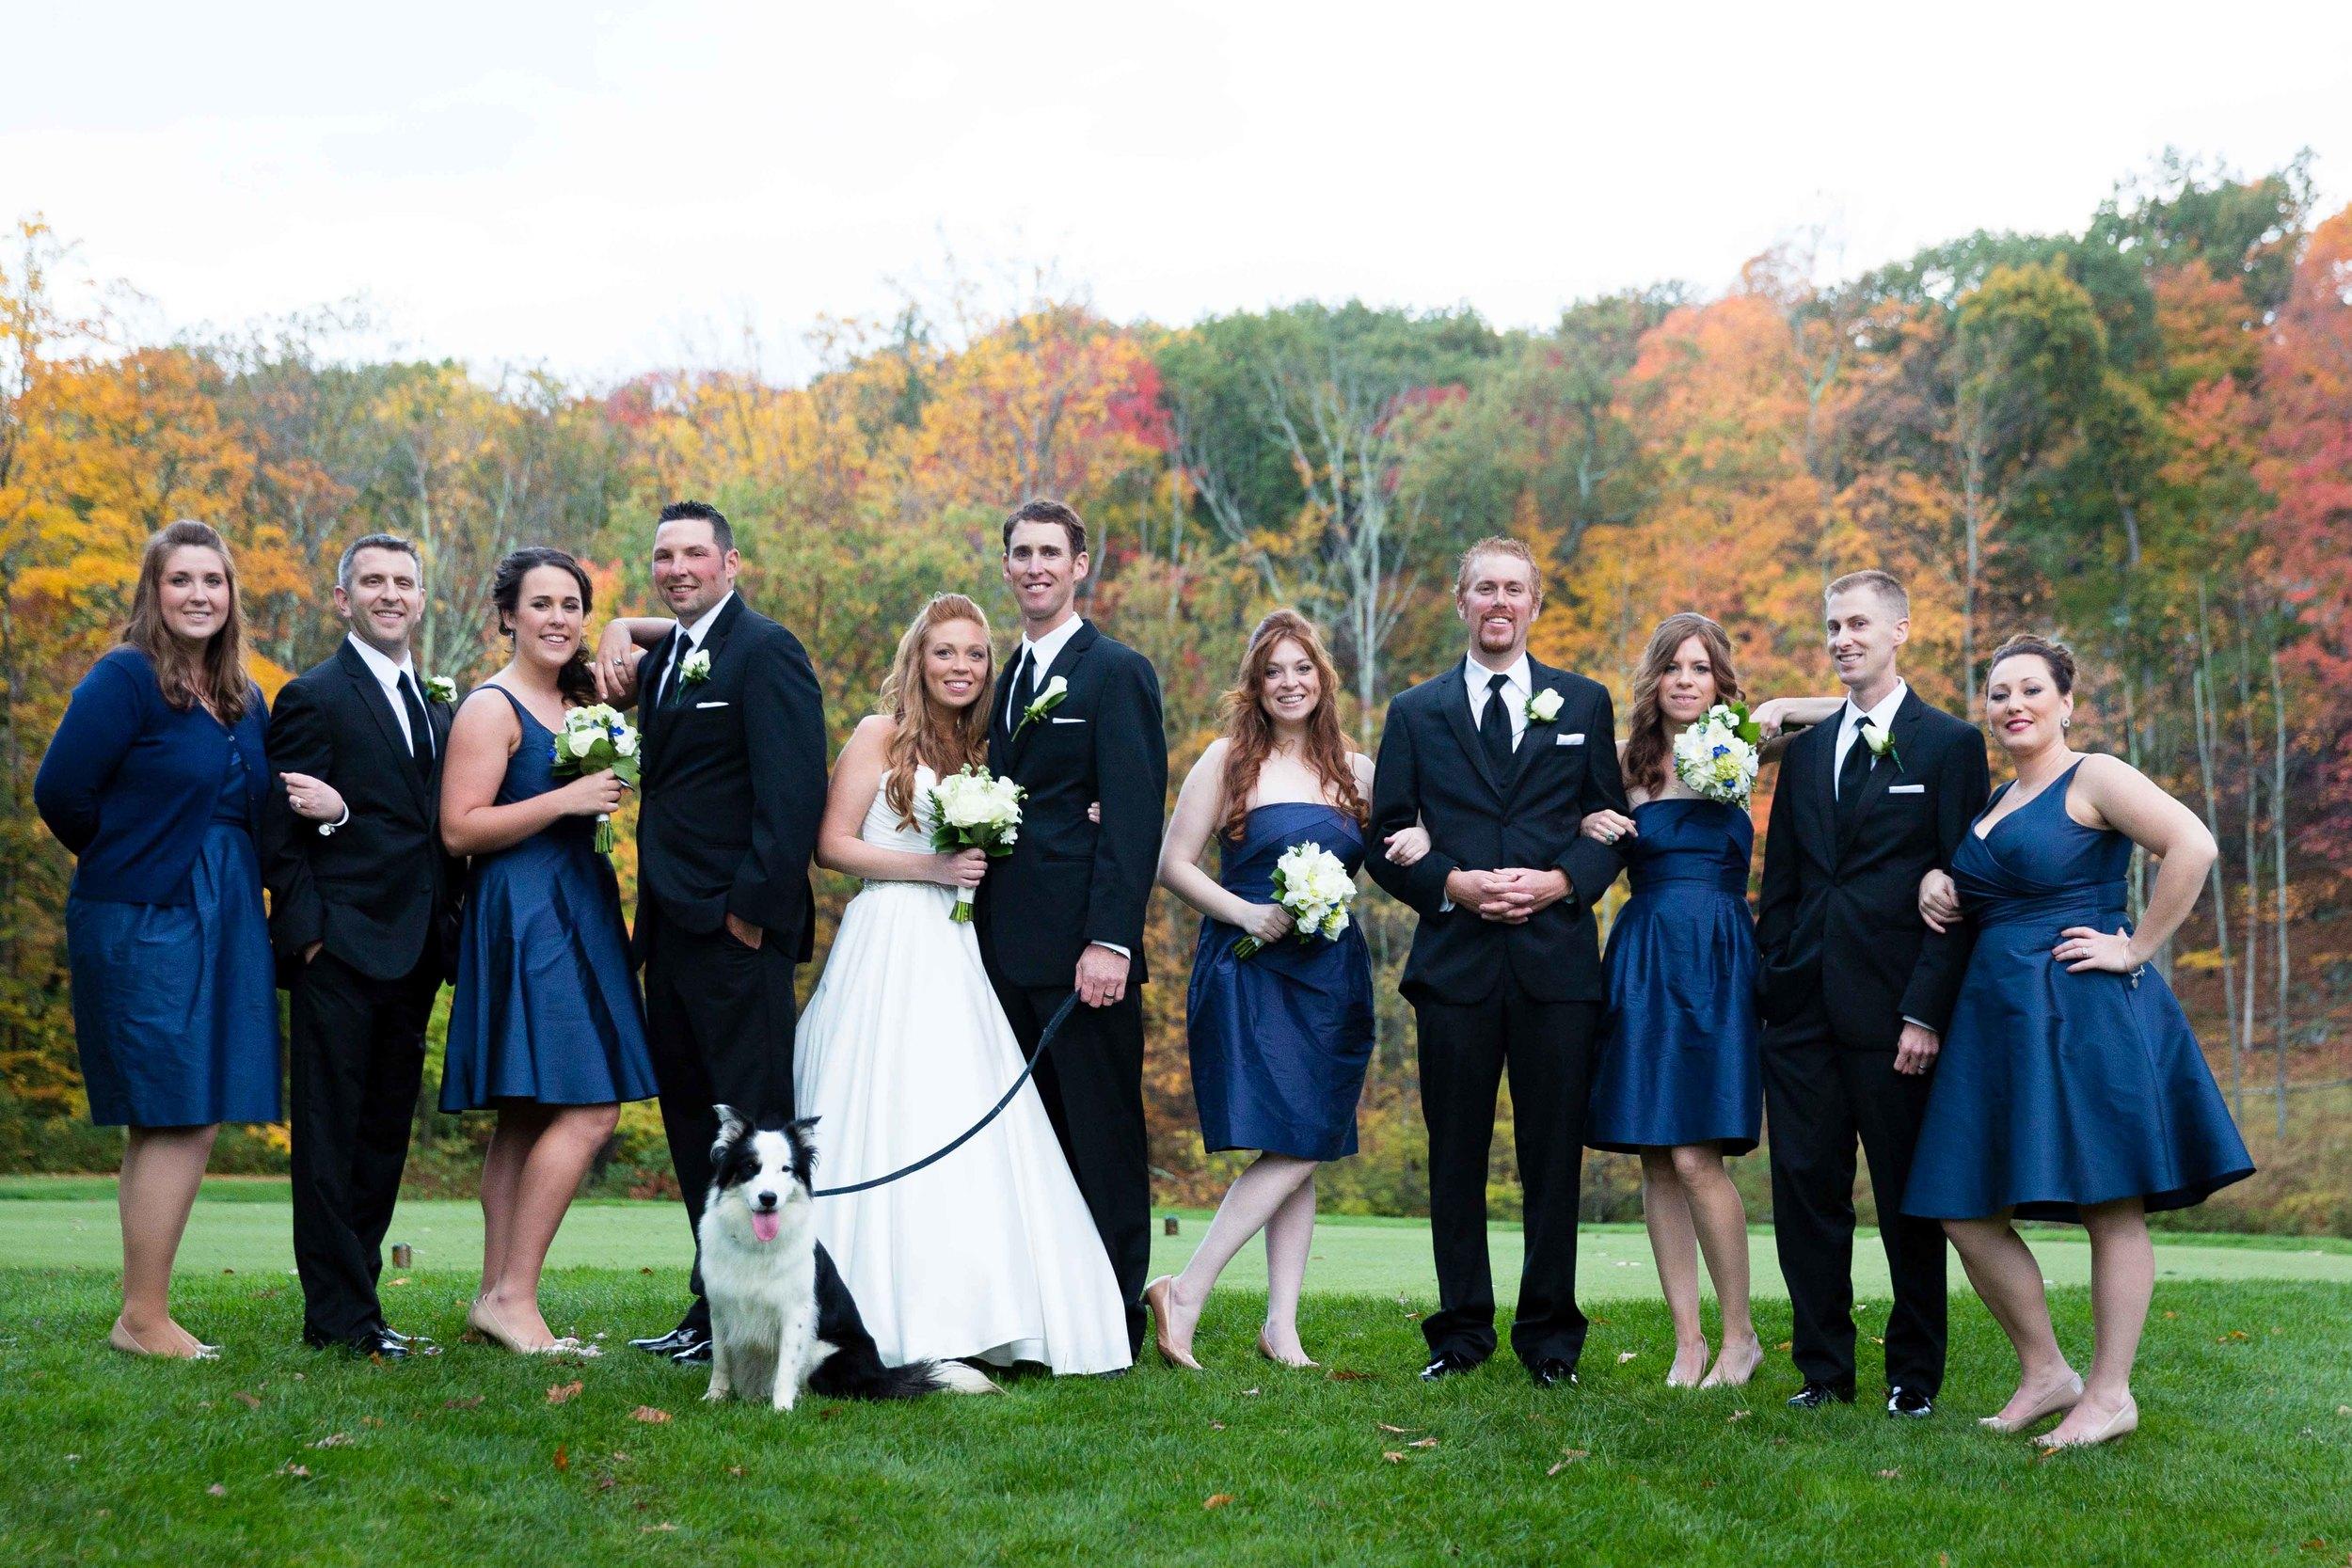 Photo-Journalistic-Wedding-Photography-by-Jacek-Dolata-CT-MA-RI-NJ-NYC-NY-VT-NH-PA-72.jpg